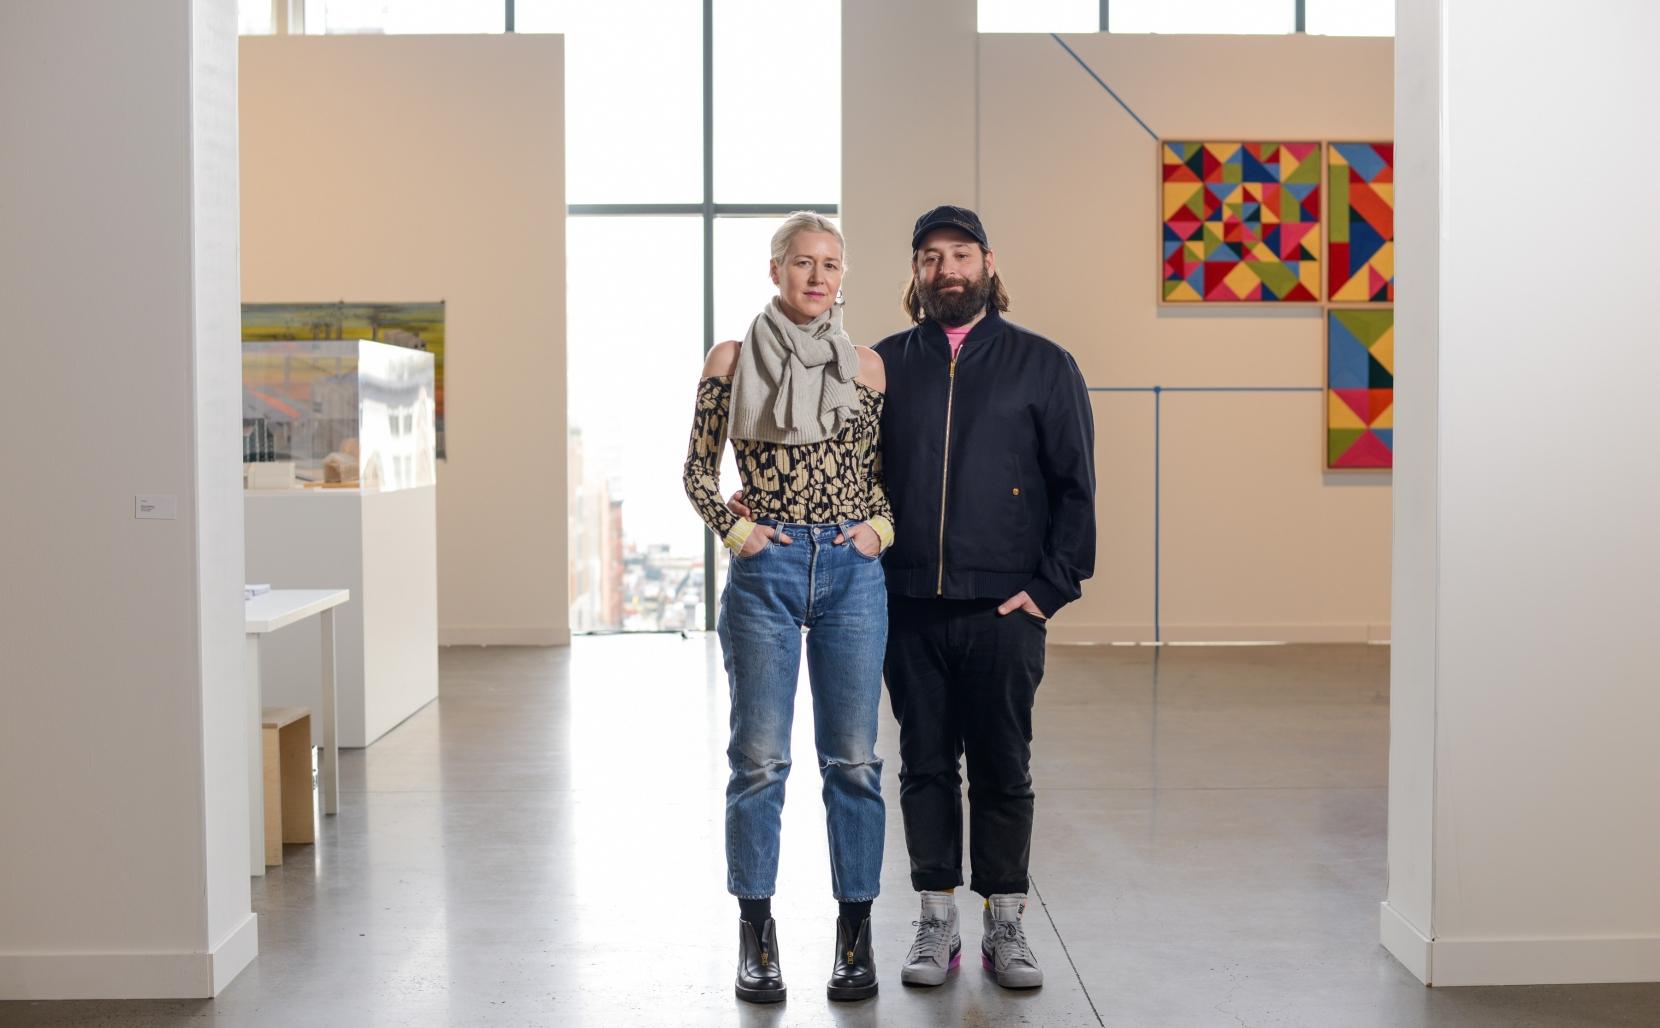 Collector Profile: Kristen and Joe Cole